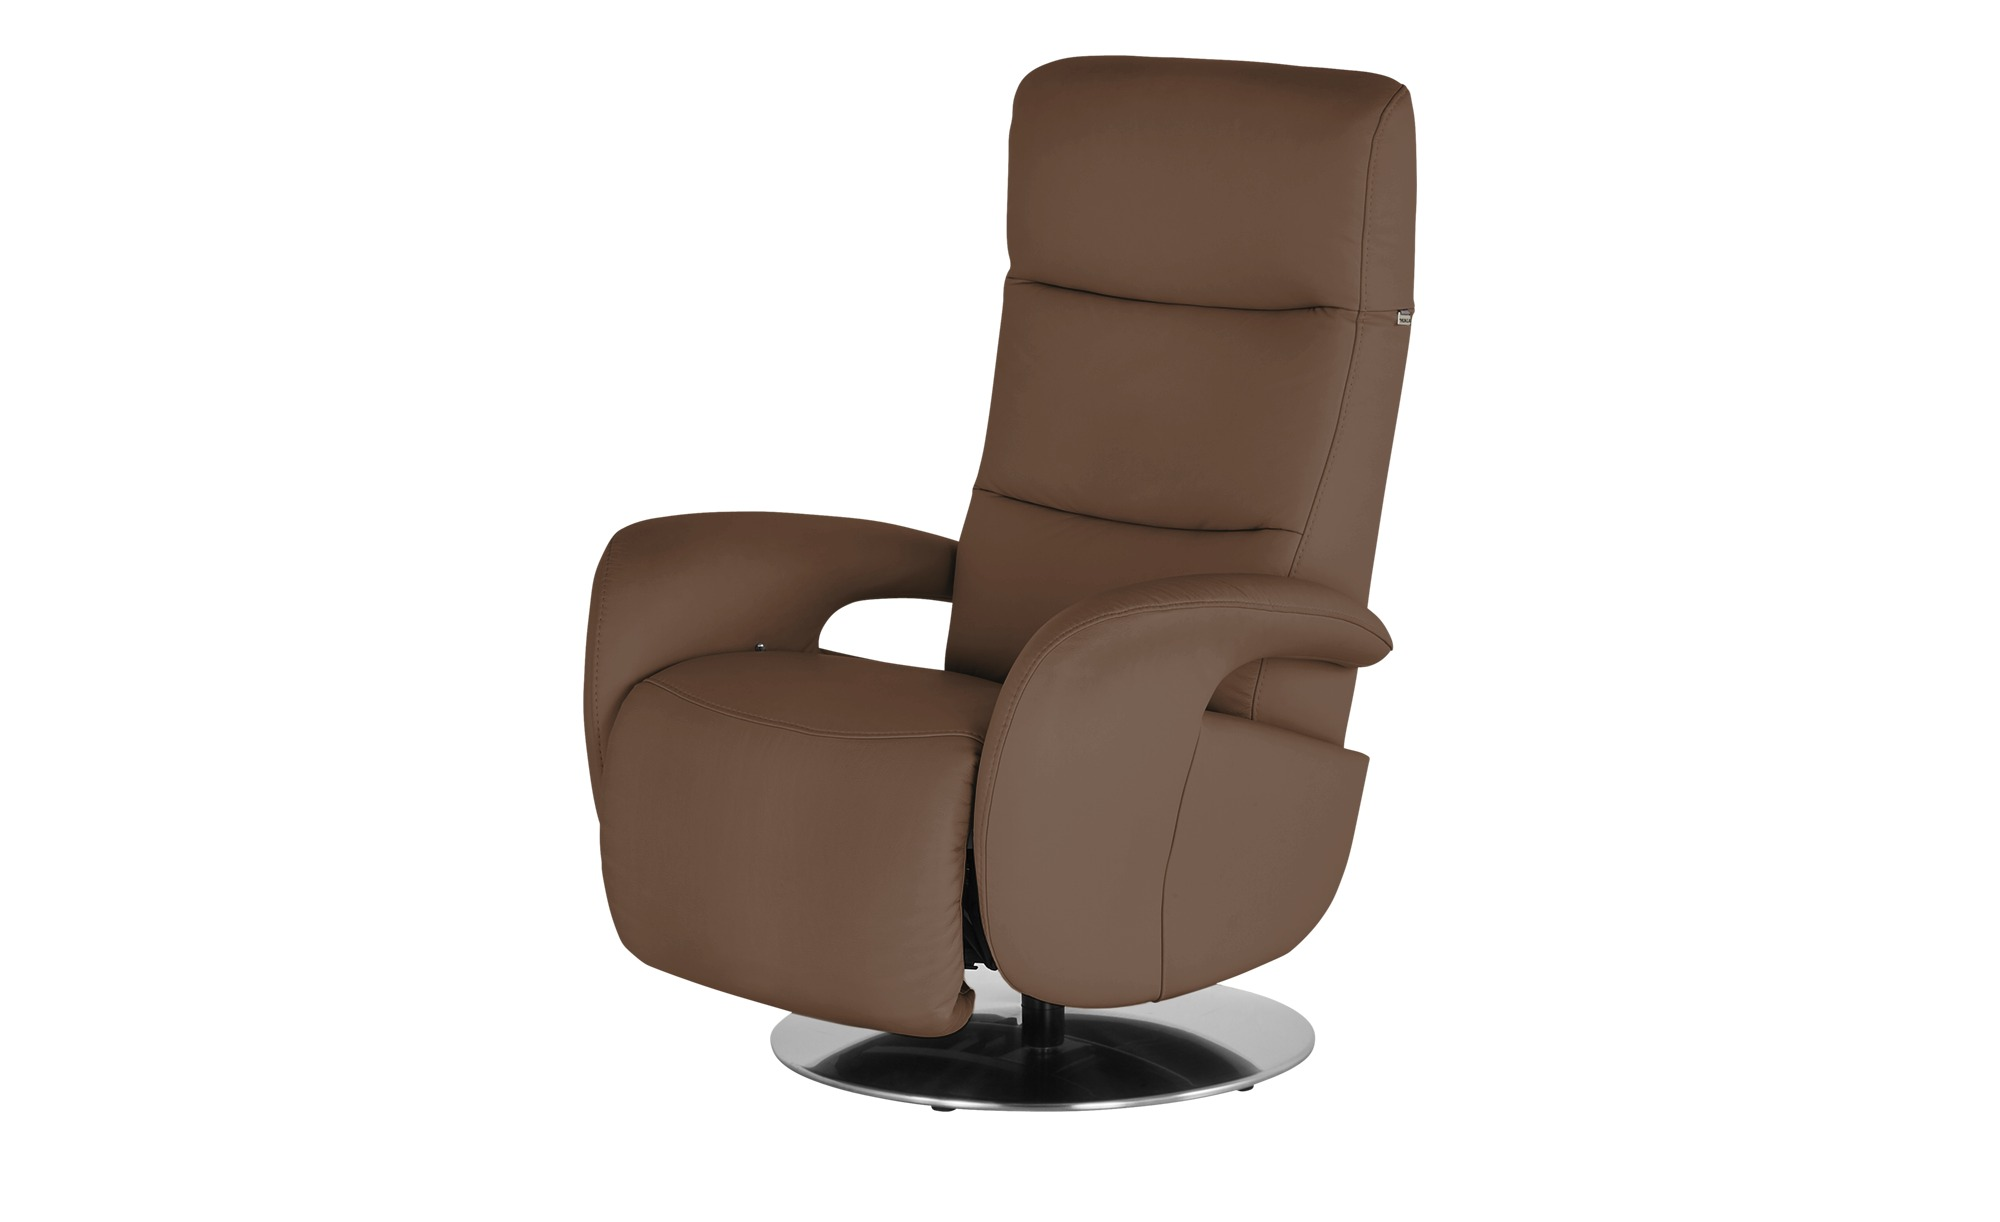 Hukla Relaxsessel  Andy ¦ braun ¦ Maße (cm): B: 79 H: 110 T: 85 Polstermöbel > Sessel > Fernsehsessel - Höffner